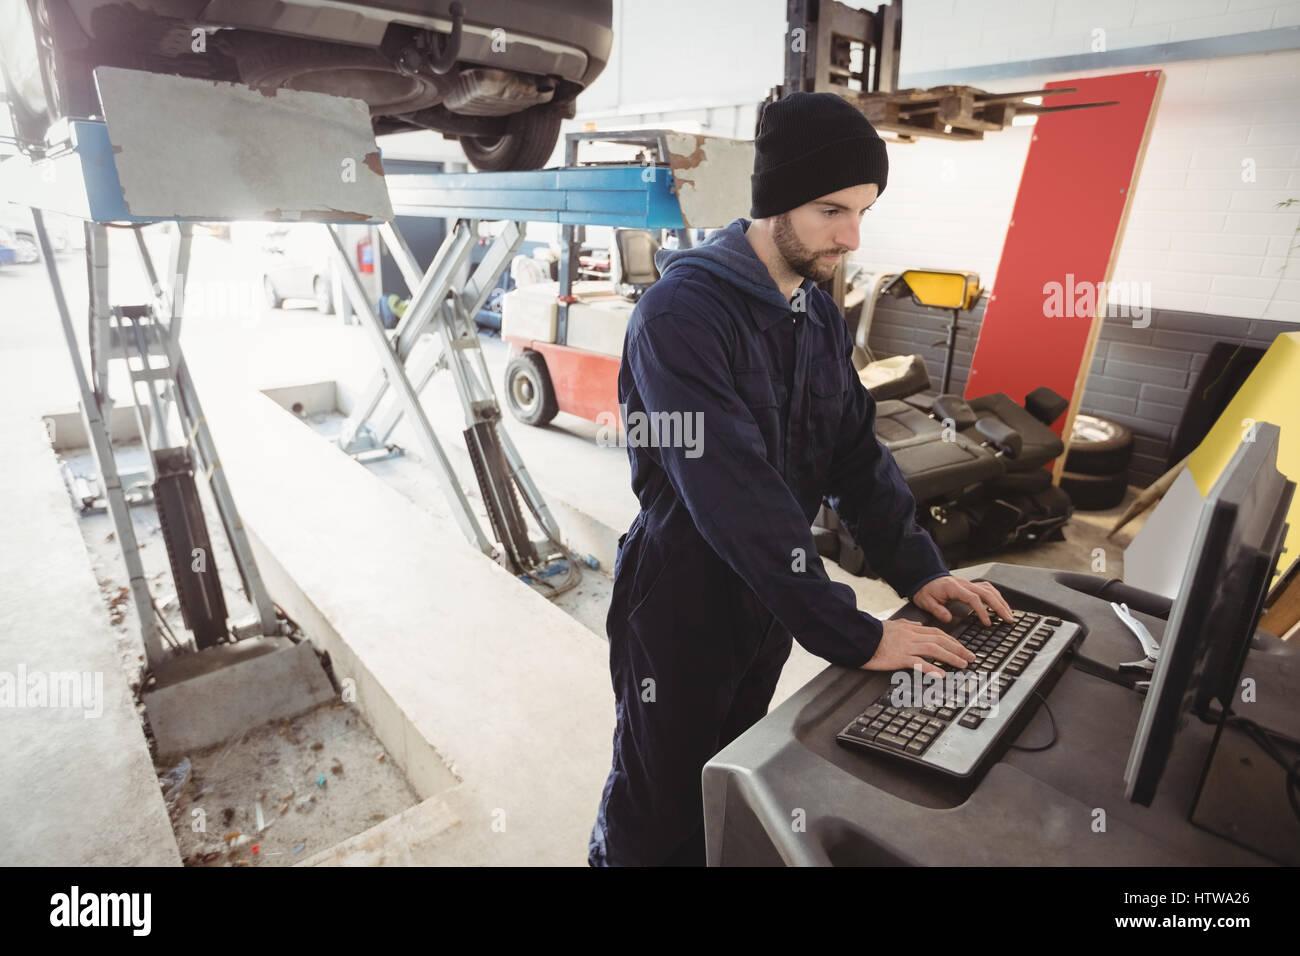 Mechanic working on personal computer - Stock Image